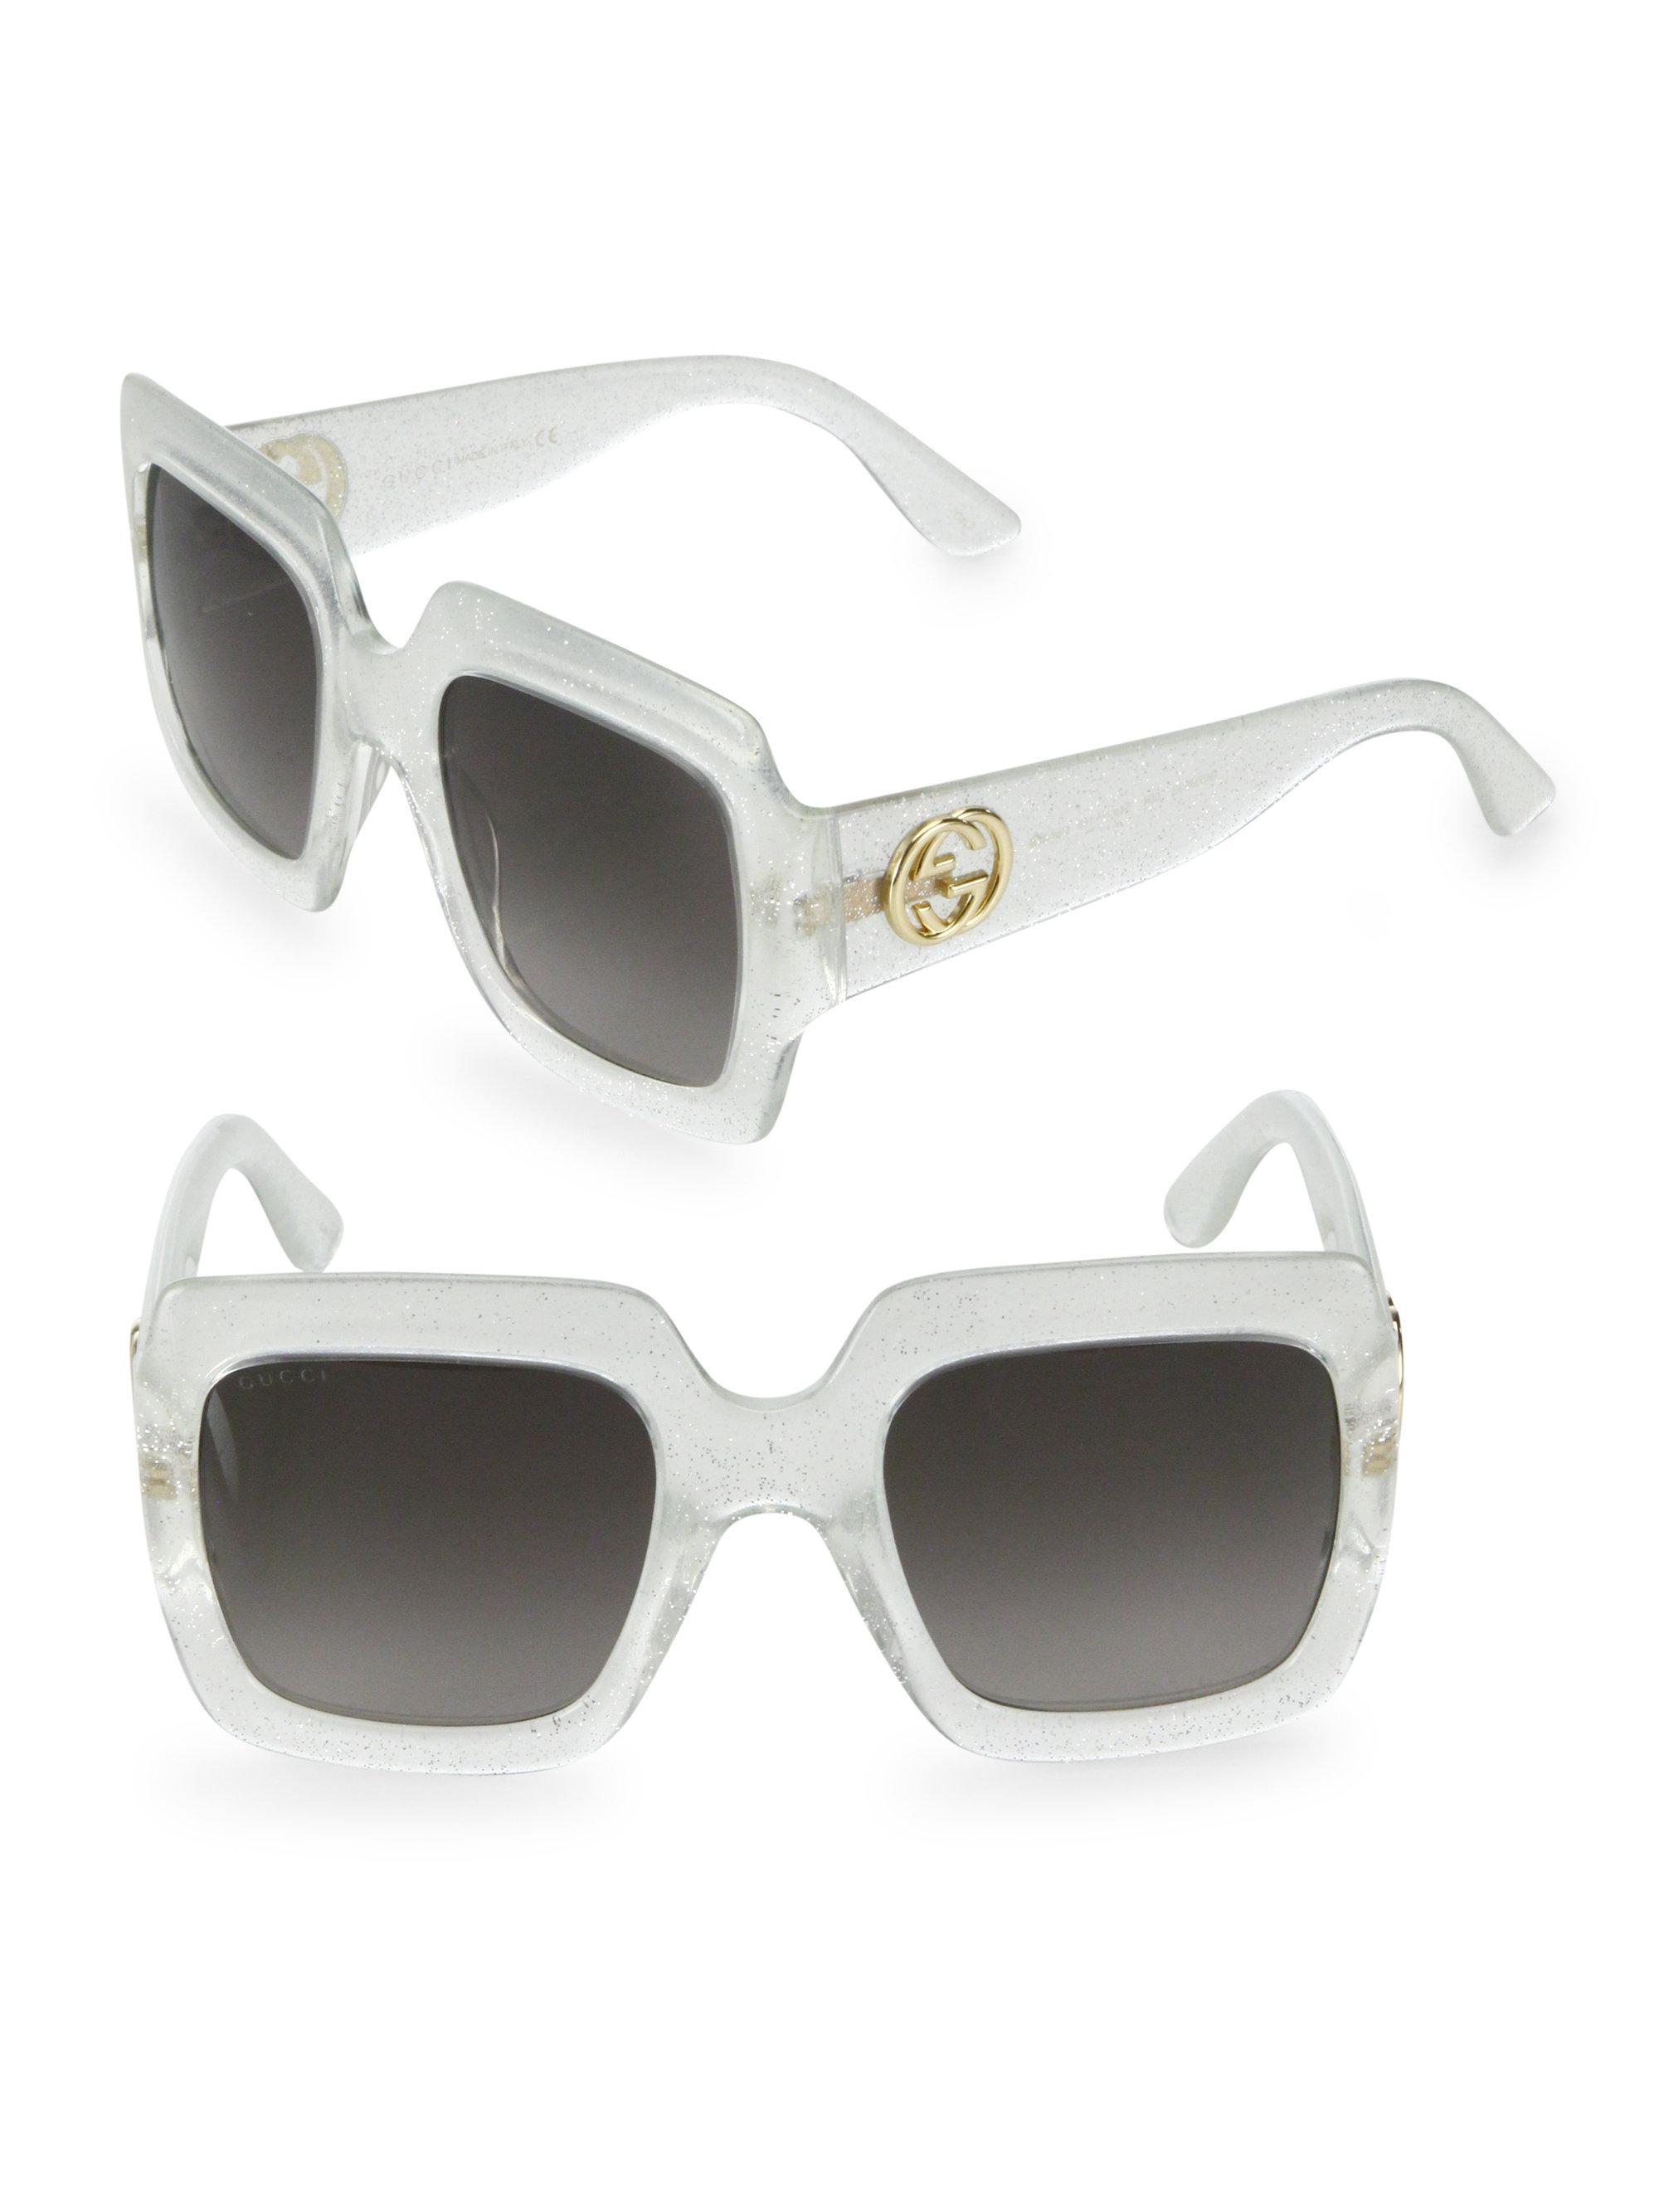 570b0aa1a8 Gucci 54mm Oversized Glitter Square Sunglasses in Metallic - Lyst